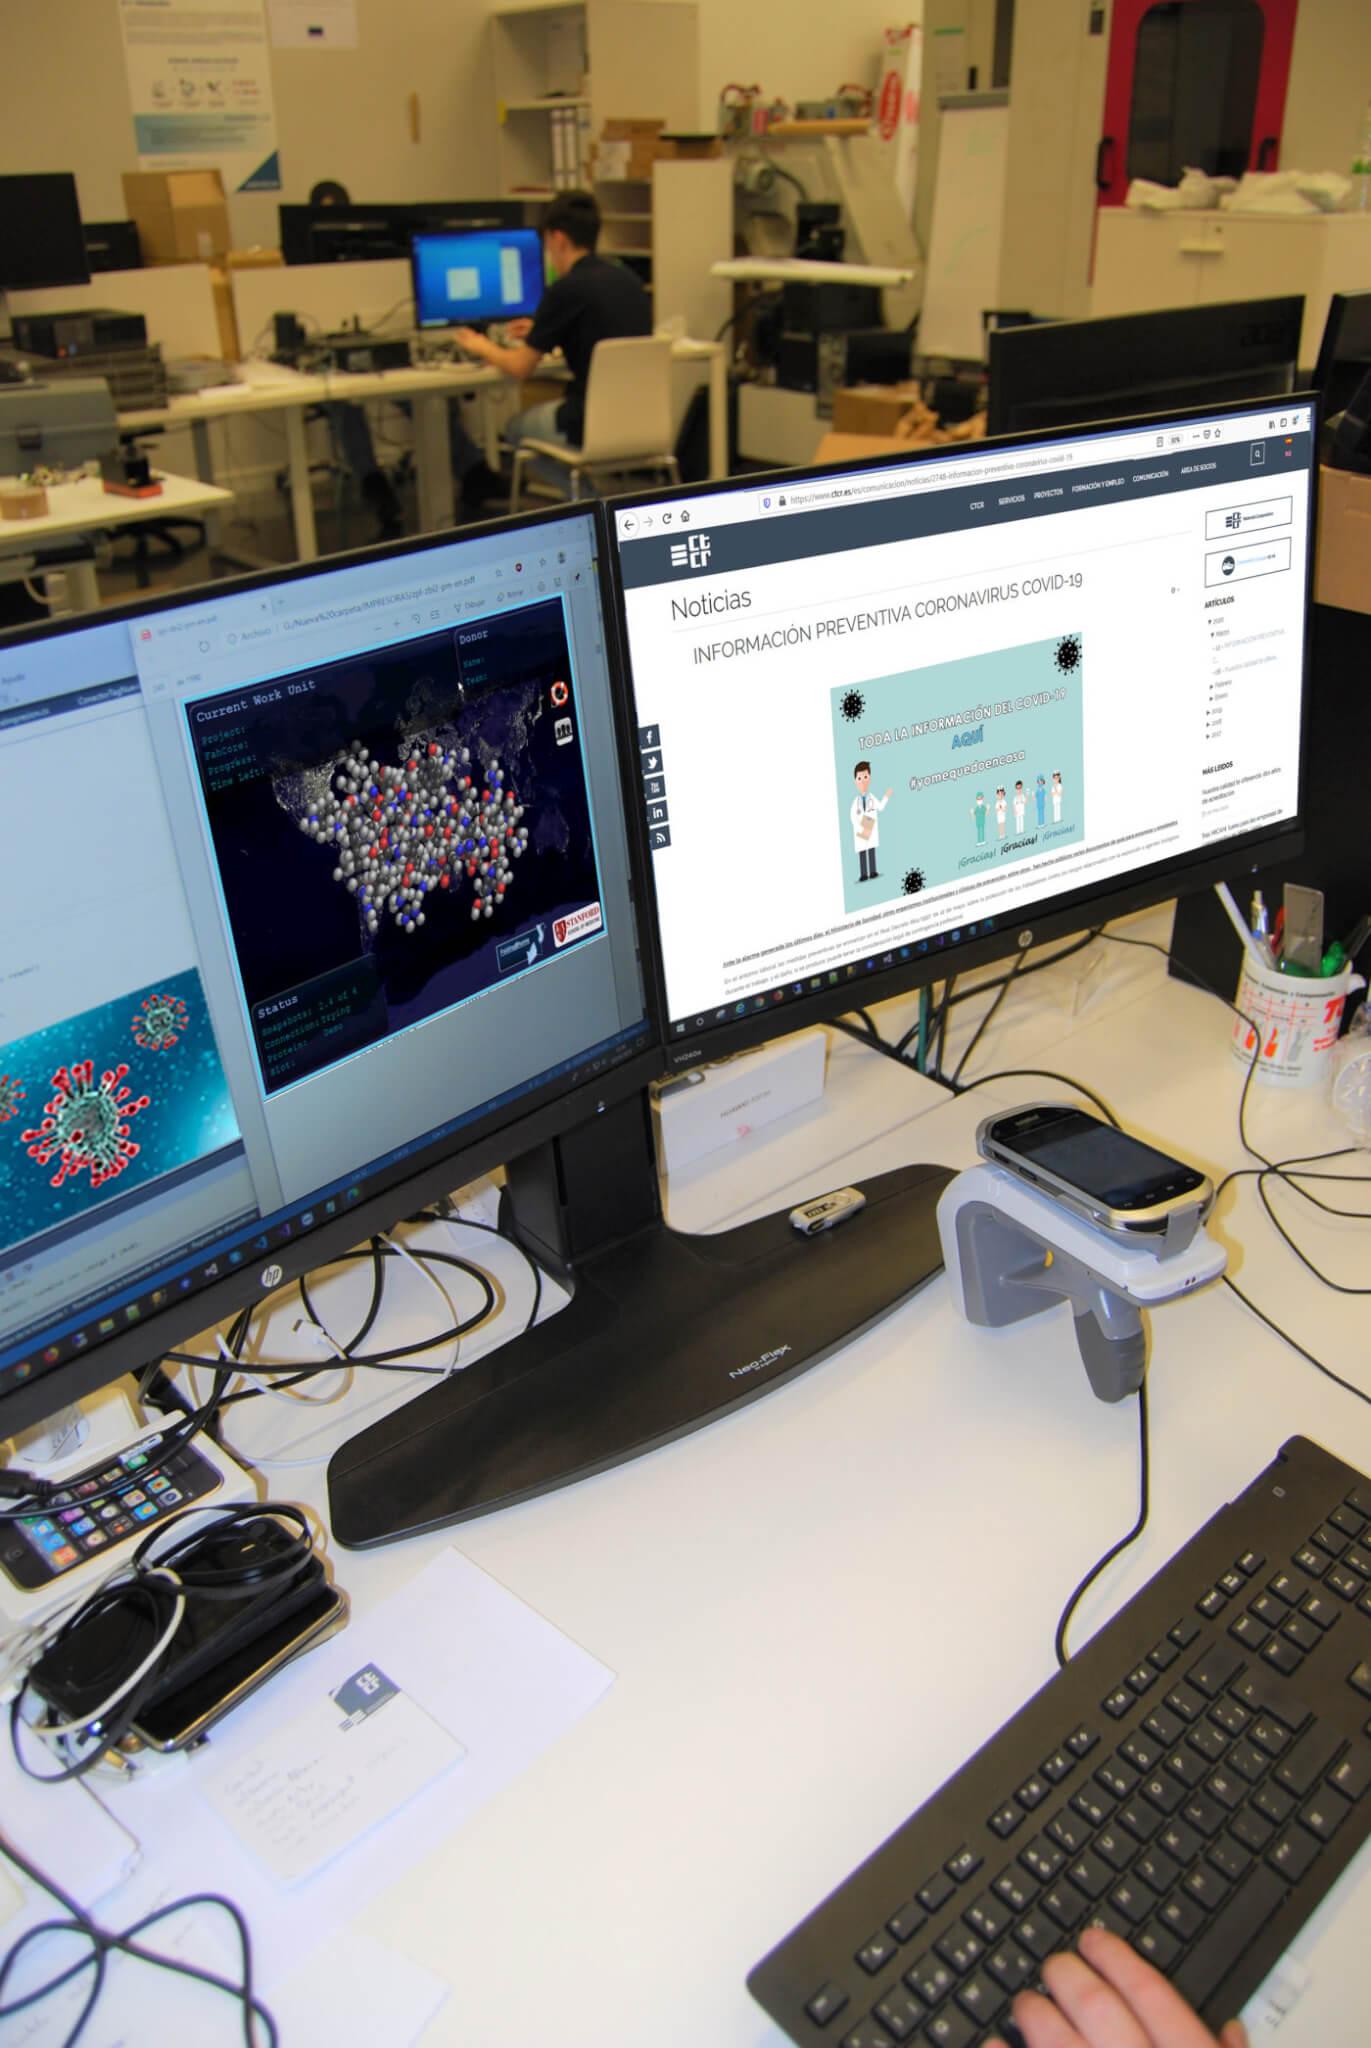 Investigadores del CTCR se unen a la lucha global contra la pandemia del COVID-19